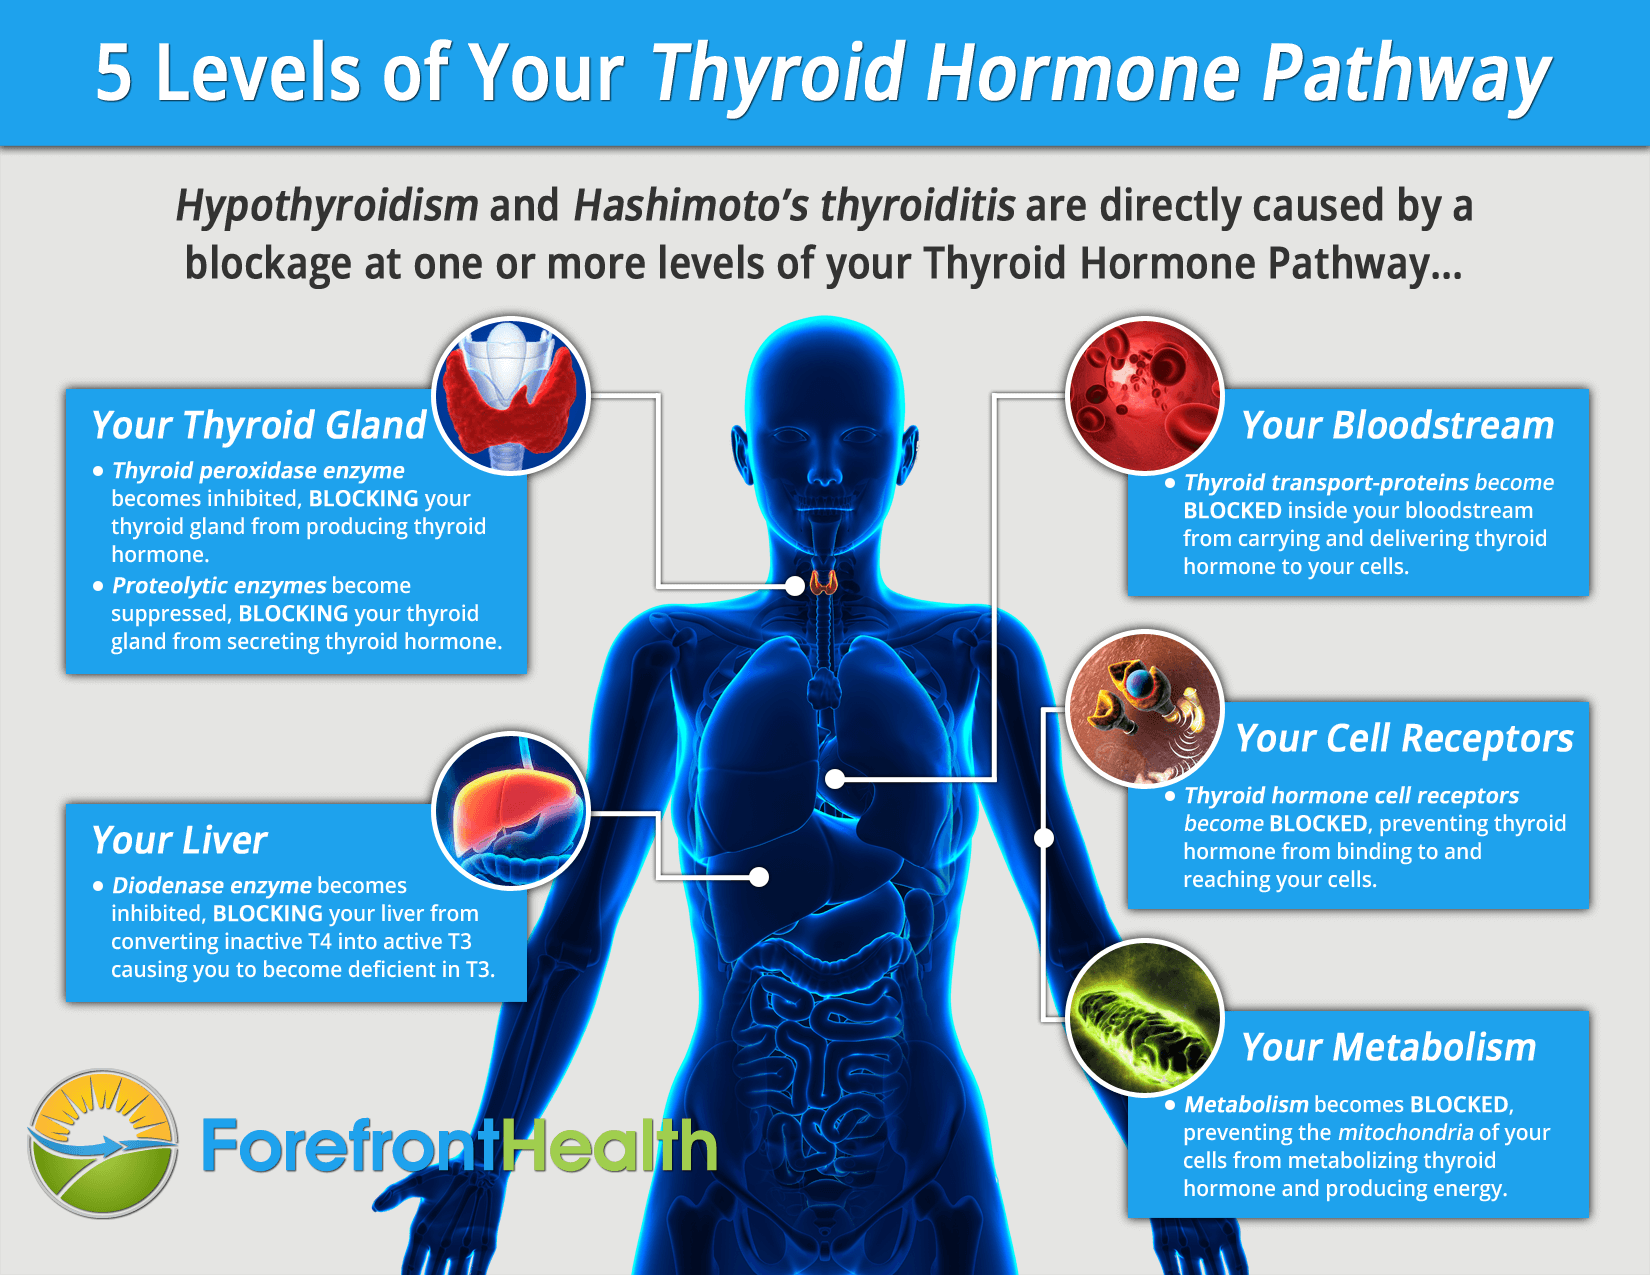 thyroid-hormone-pathway-infographic